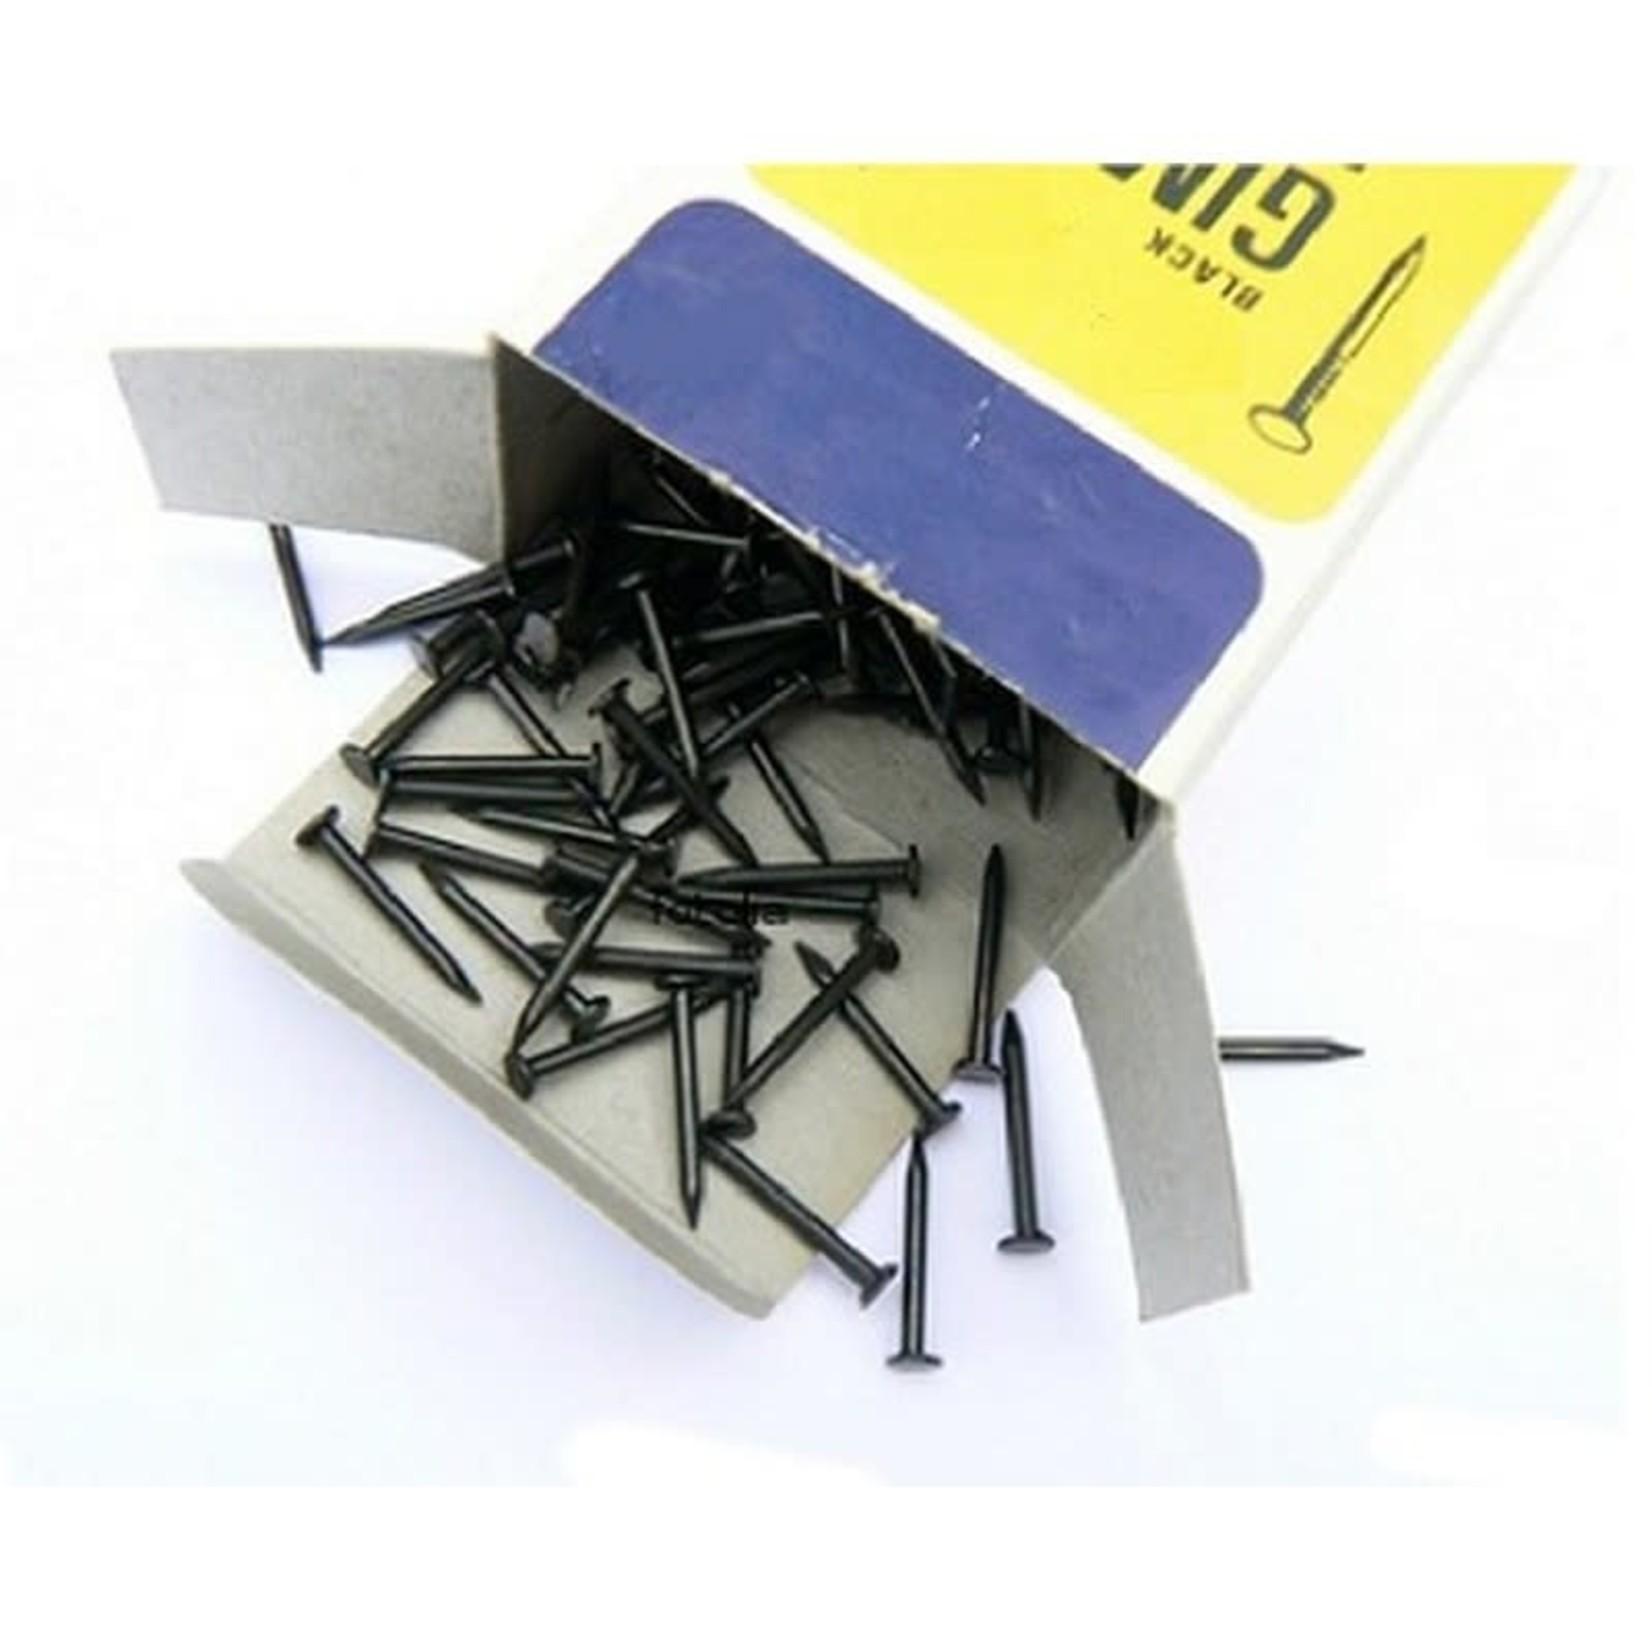 Frame Nails Box 500g - (Bee Keeping Equipment)